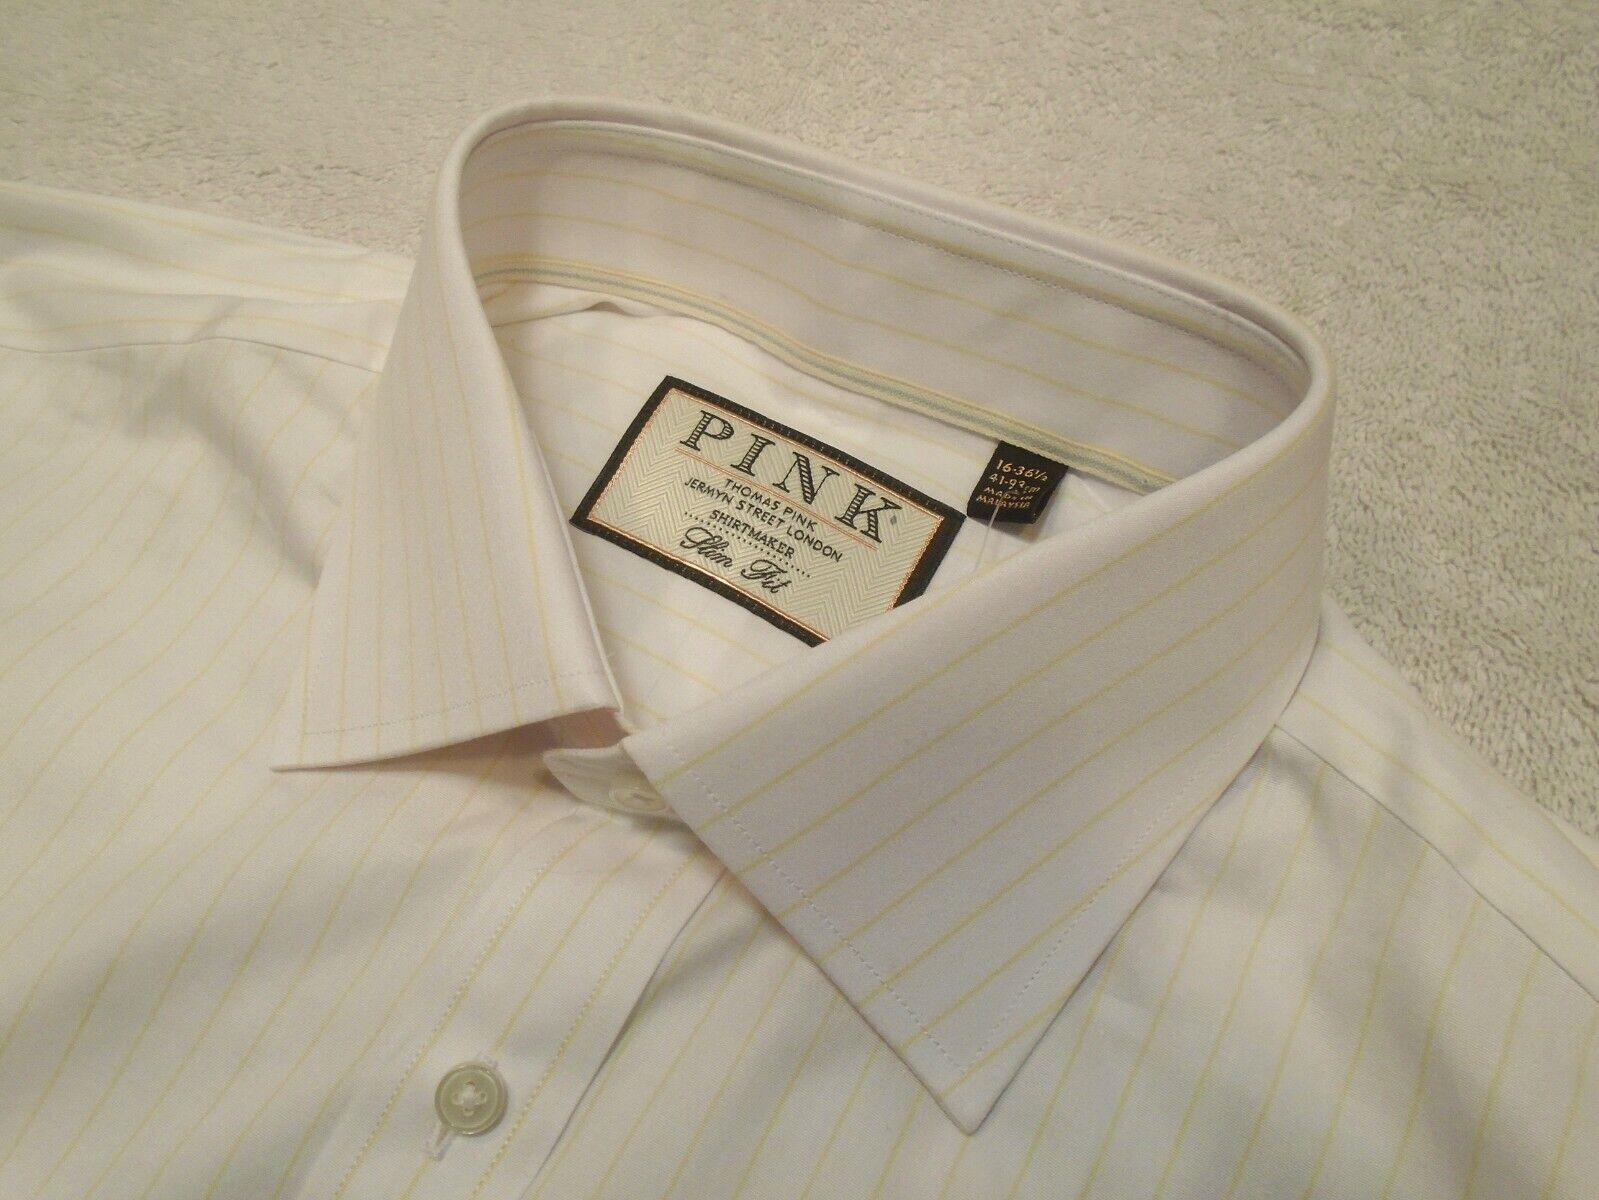 3b9440160e40 Pink Holbert White & Yellow Stripe Dress Shirt NWT 16 x 36 37 Thomas ...